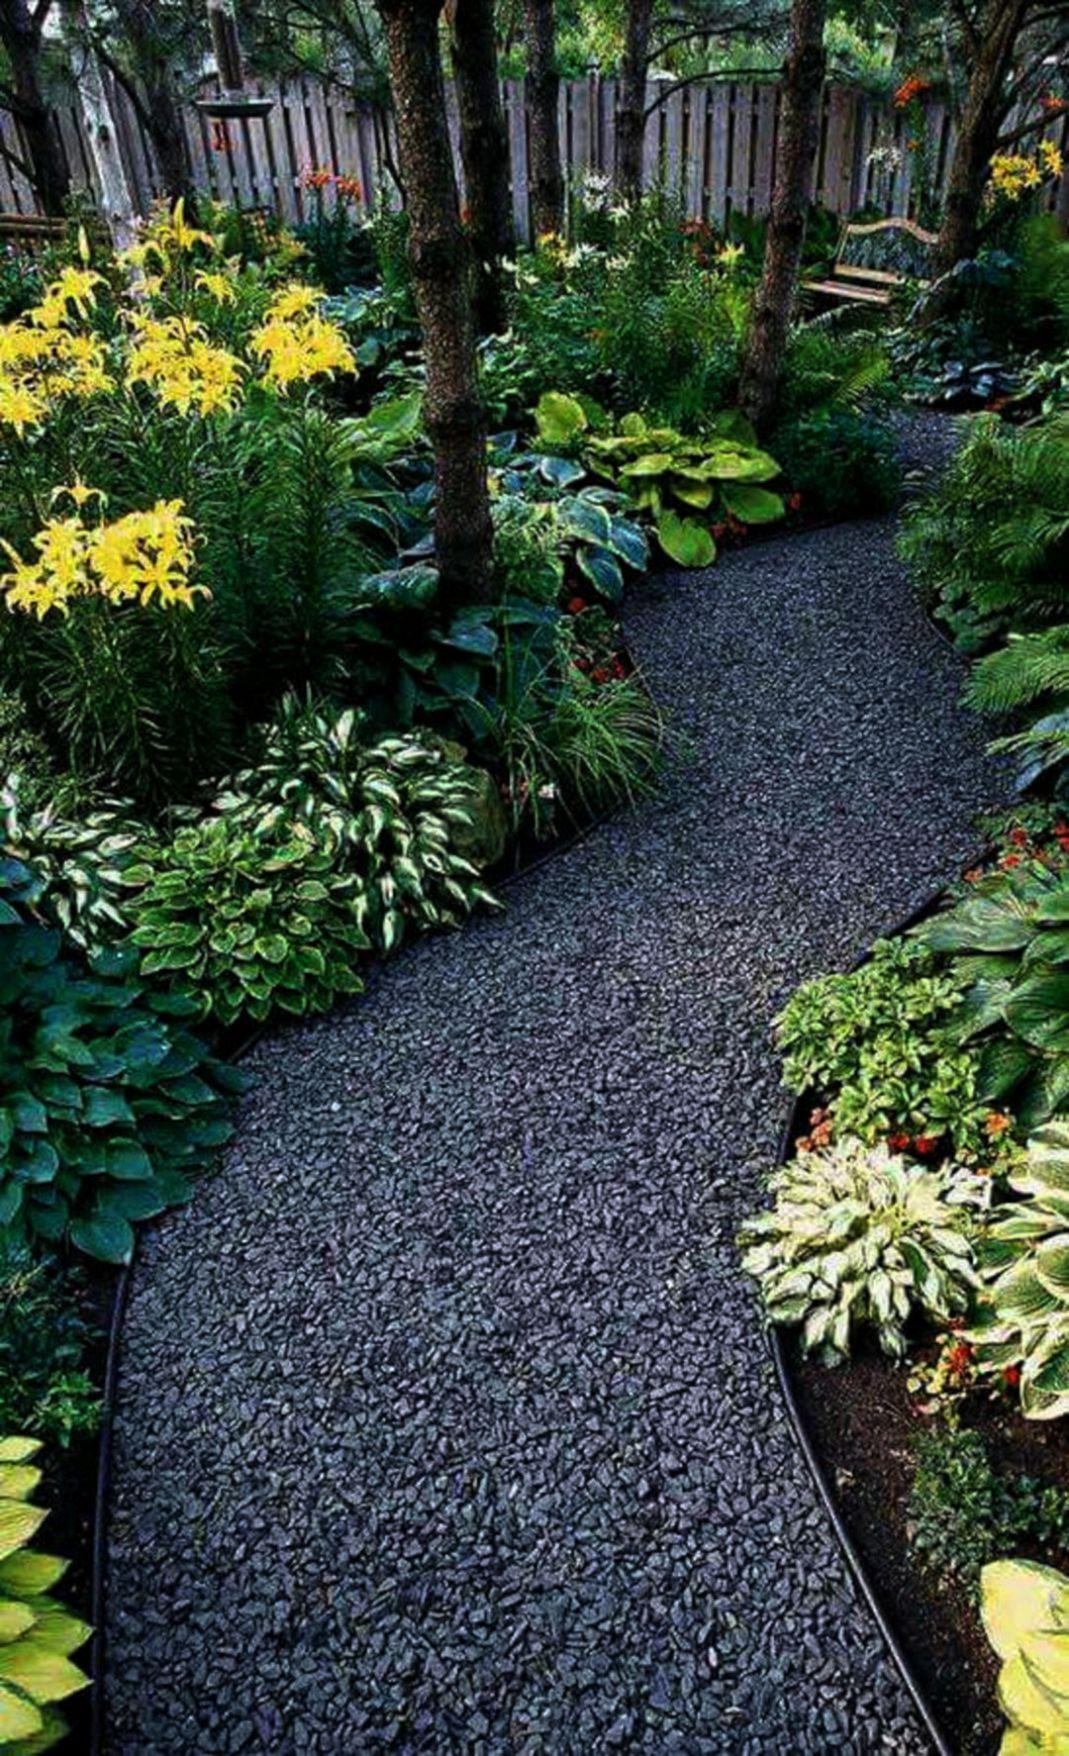 Garden Landscaping And Design Beside Garden Landscaping Ideas South Africa Your Landscape Garden Desi Landscape Design Backyard Landscaping Small Garden Design